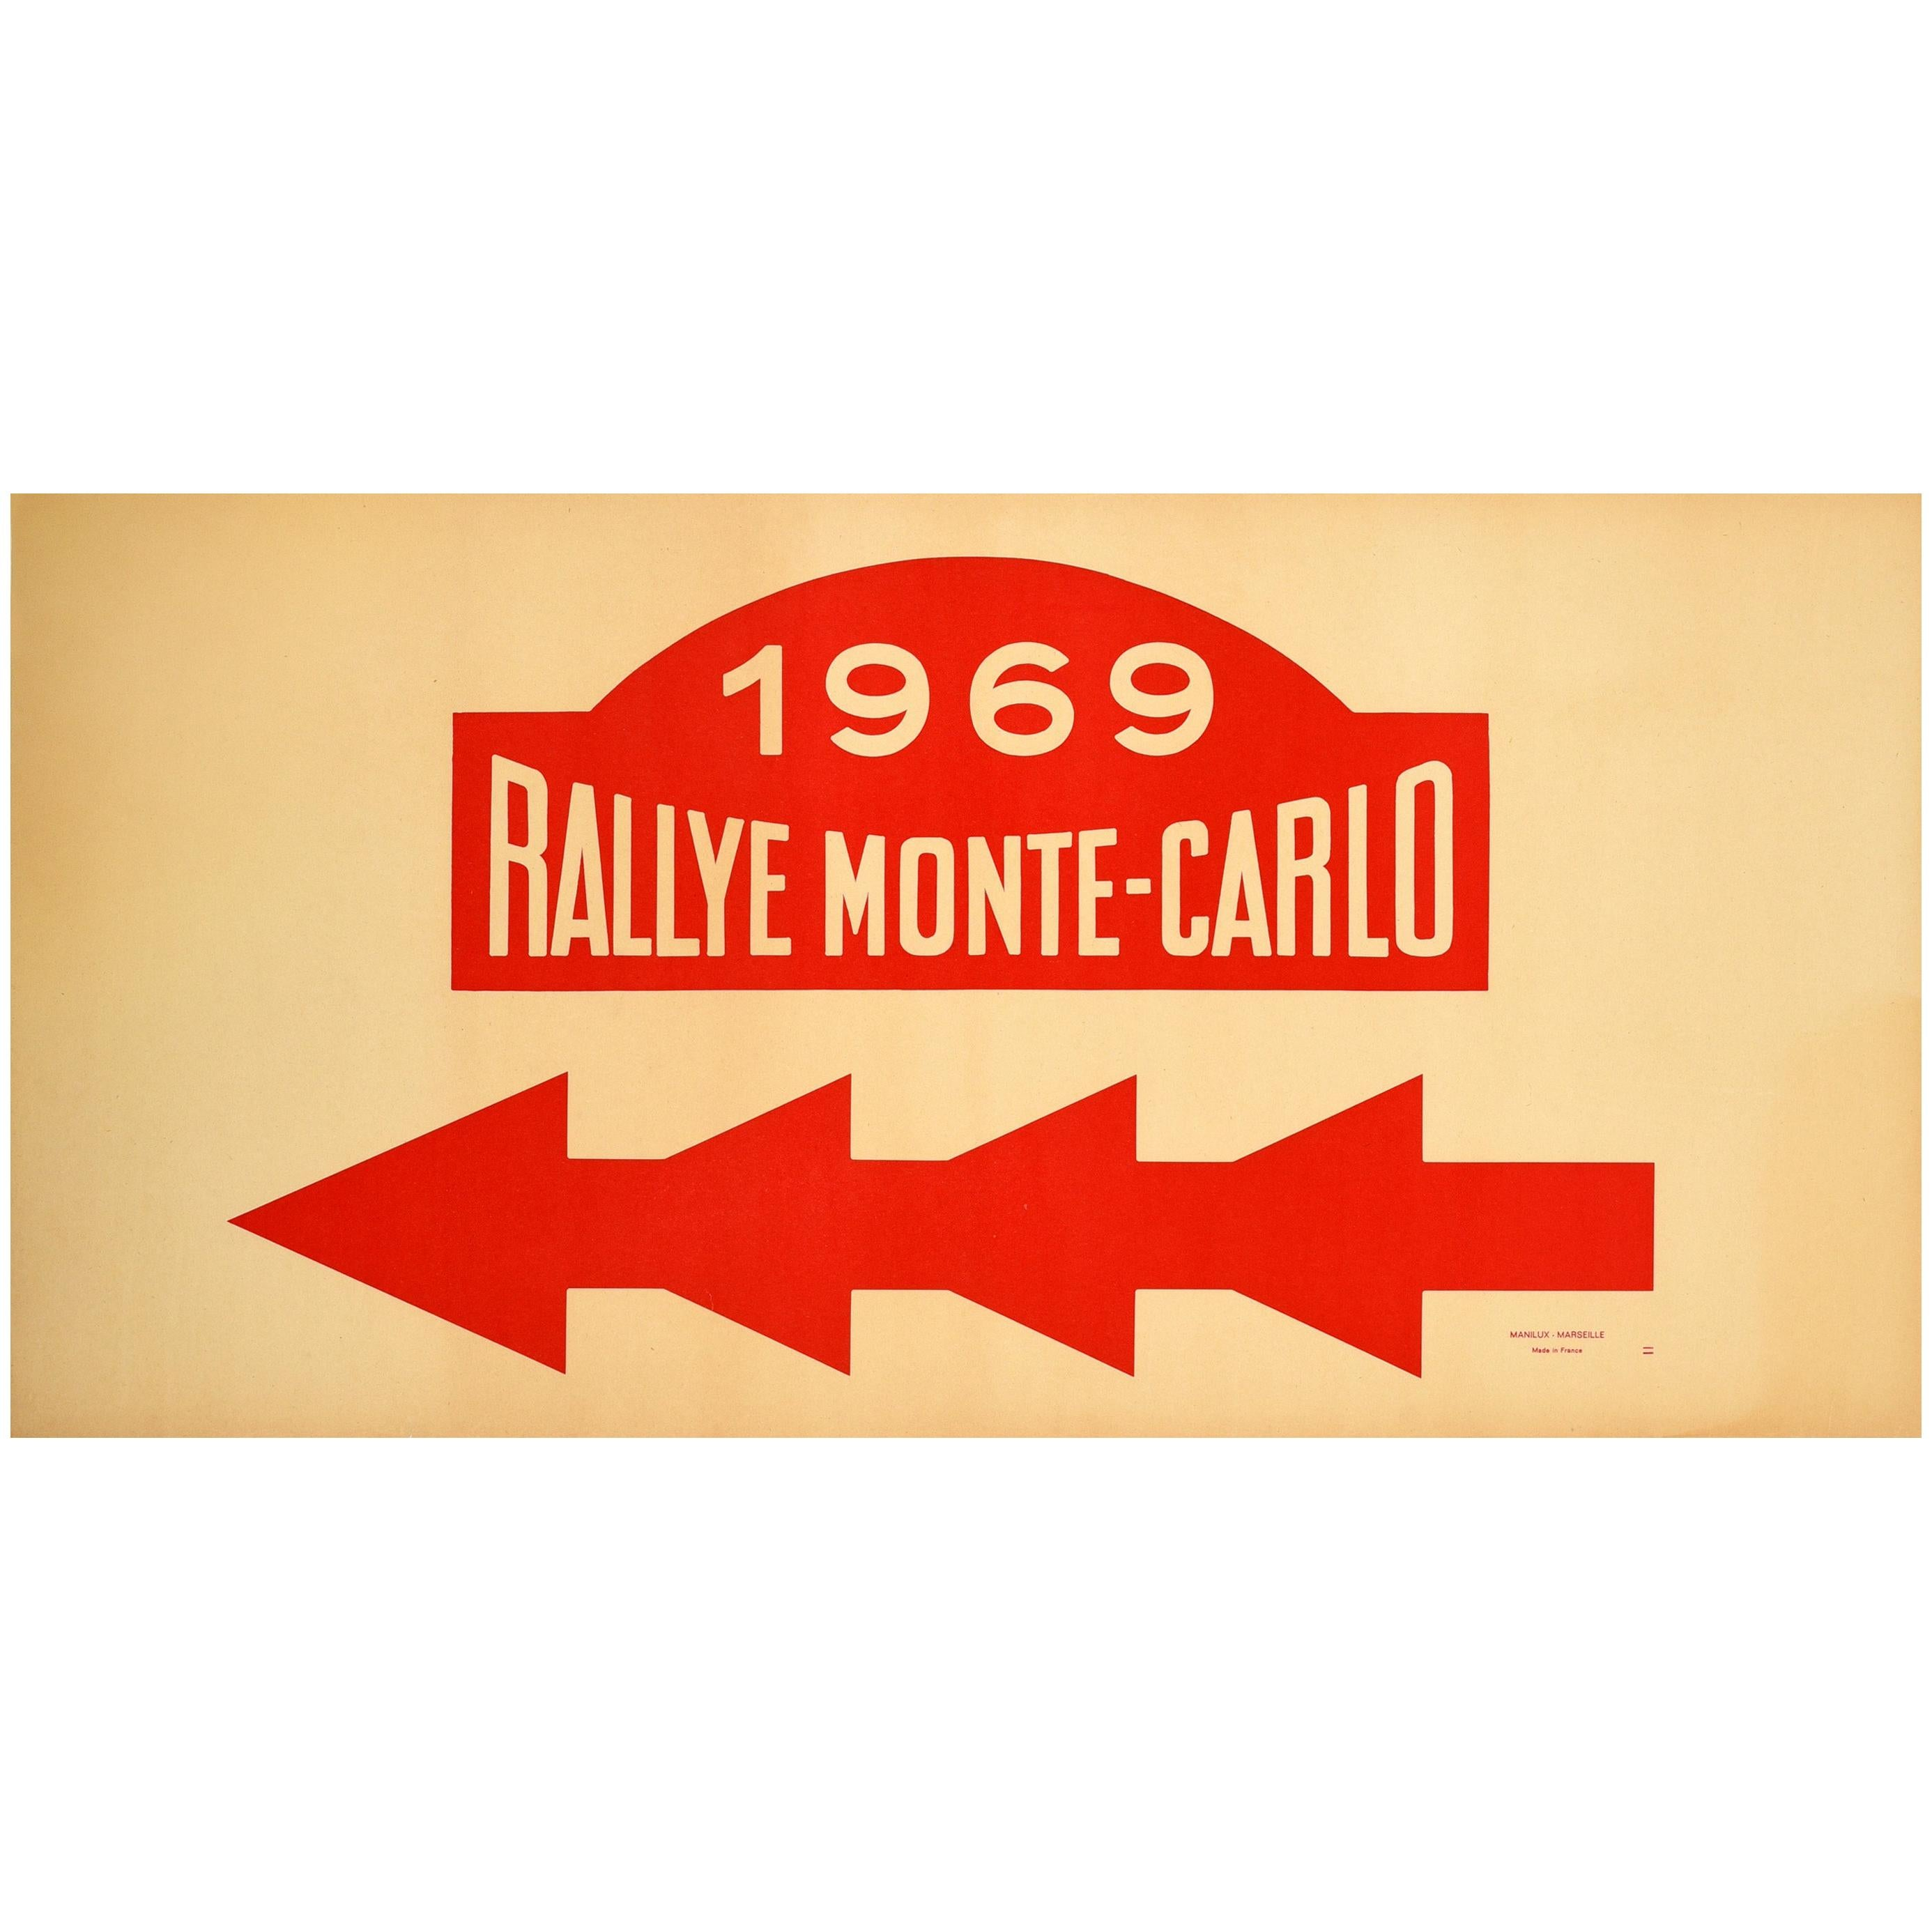 Original Vintage Poster 1969 Rallye Monte Carlo Rally Racing Motor Sport Monaco